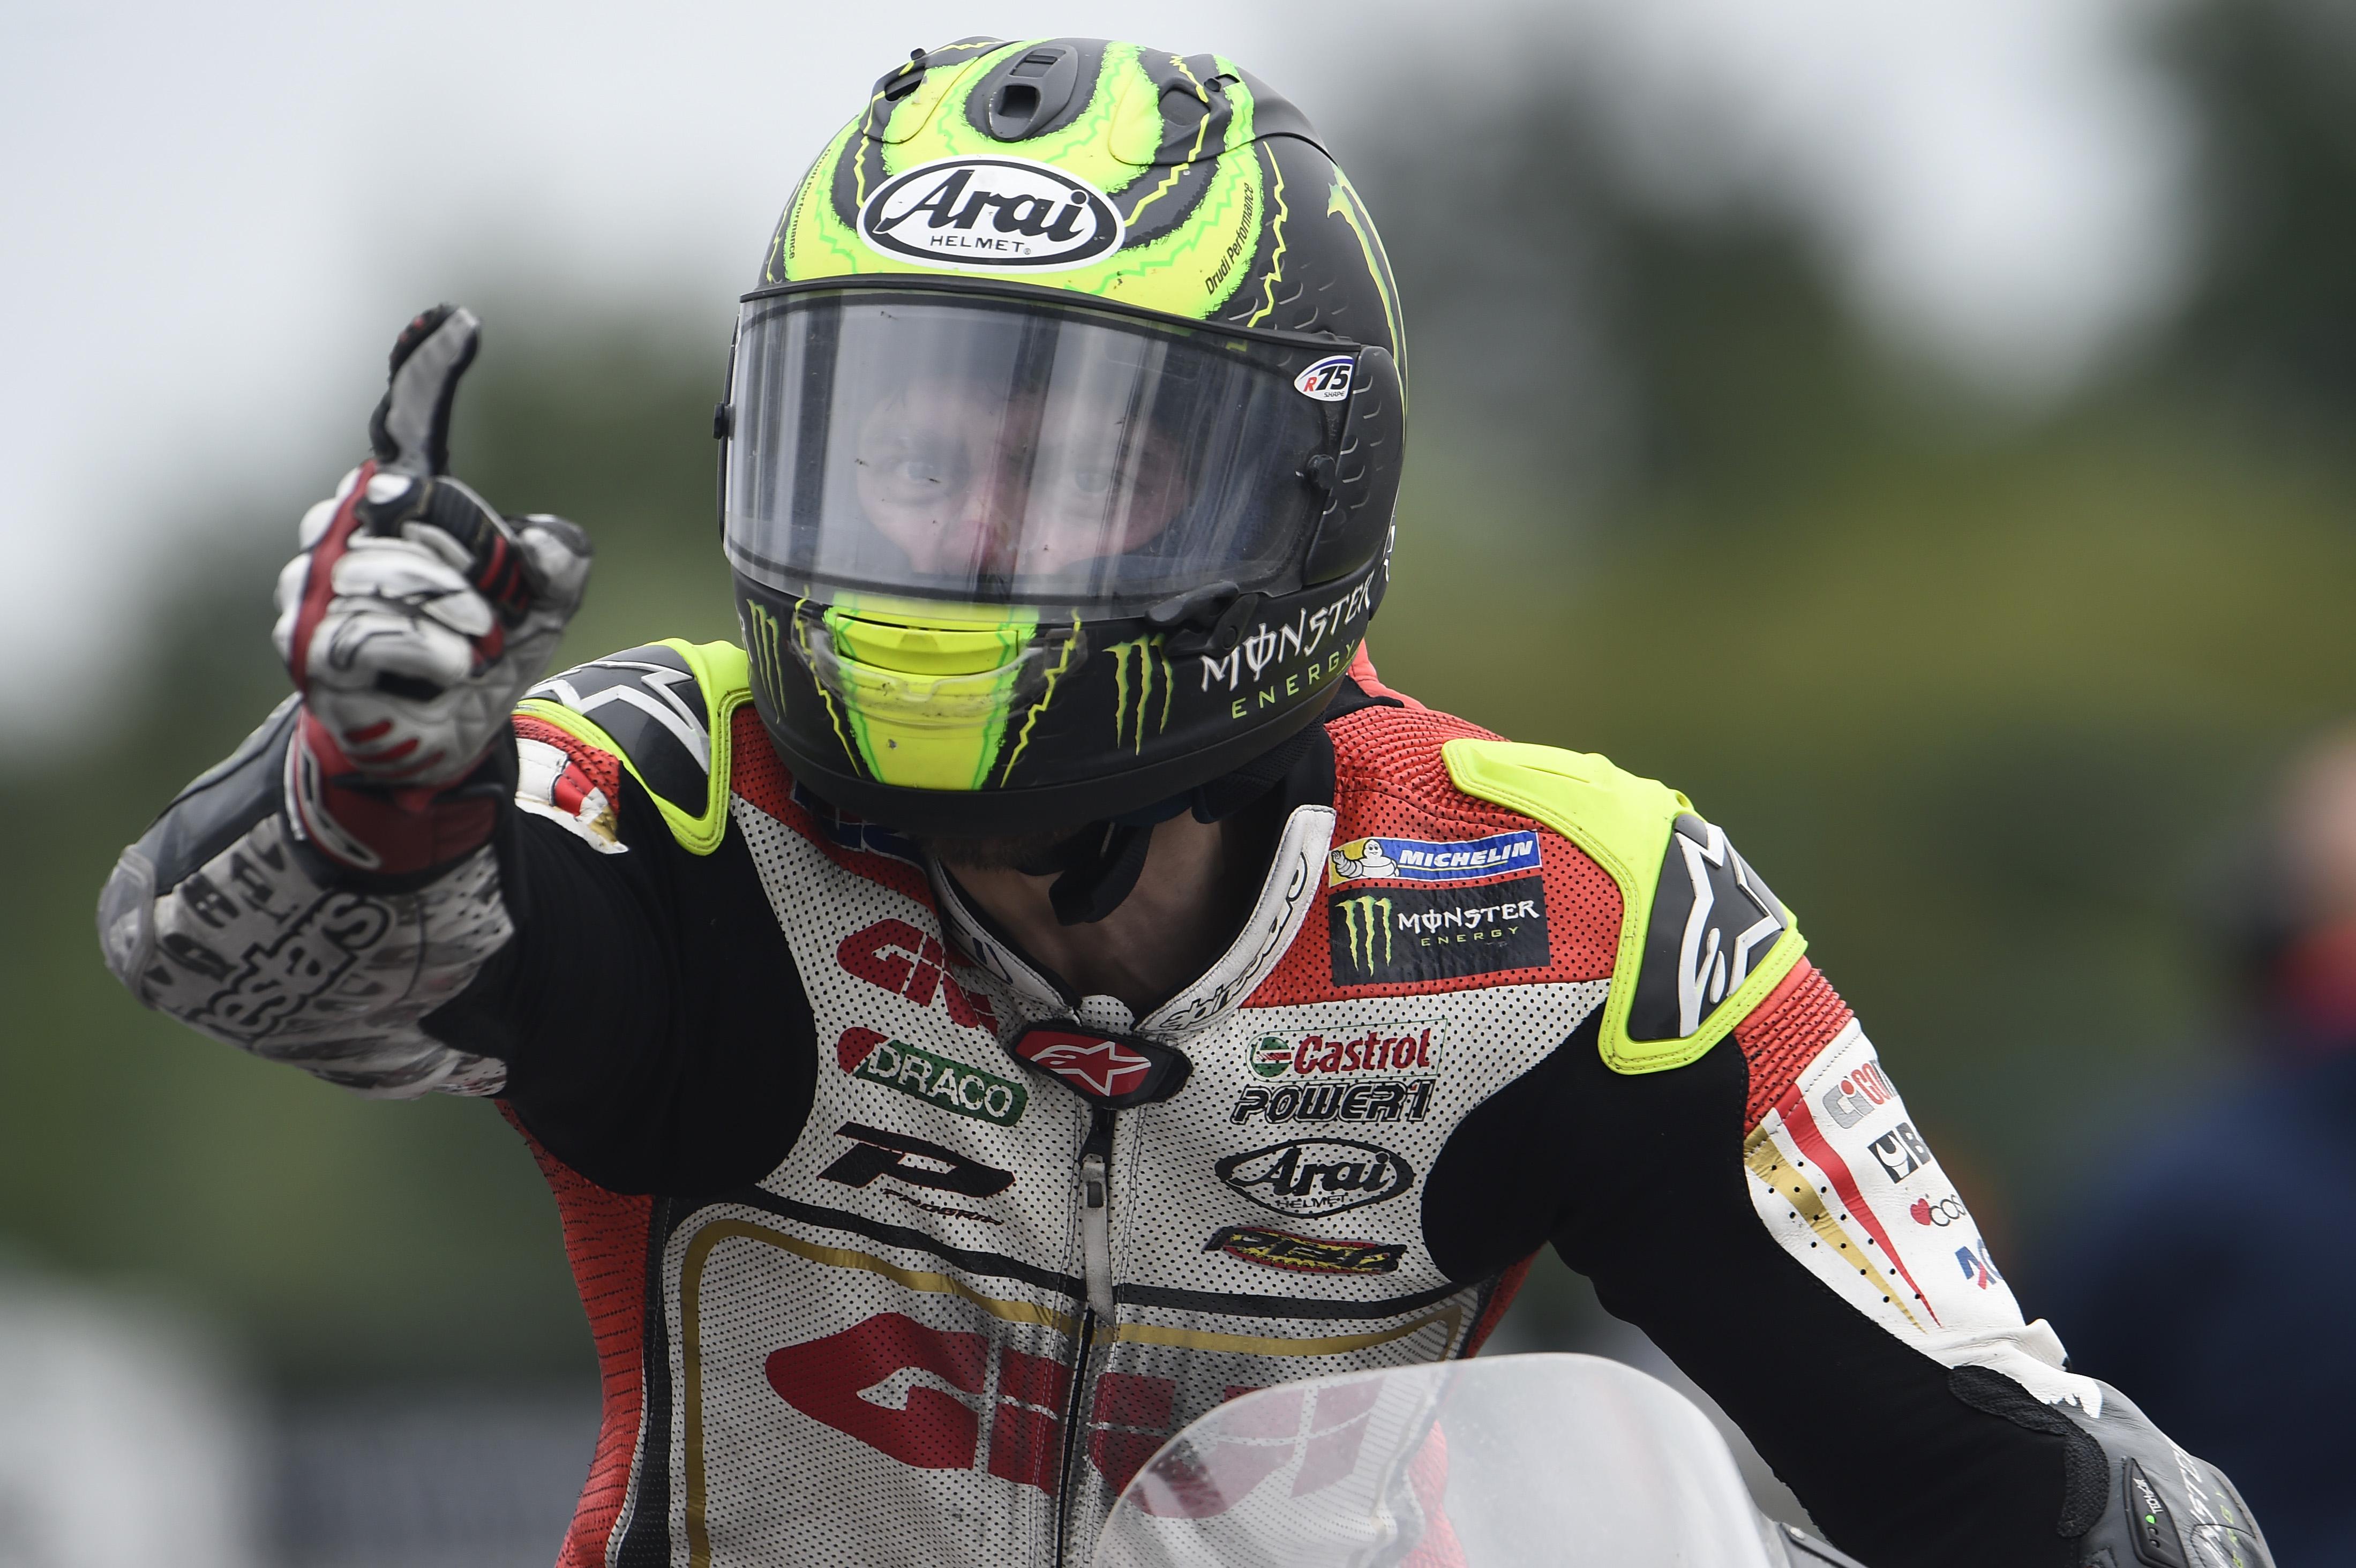 Cal Crutchlow, LCR Honda, Brno, 2016 Czech Republic MotoGP,